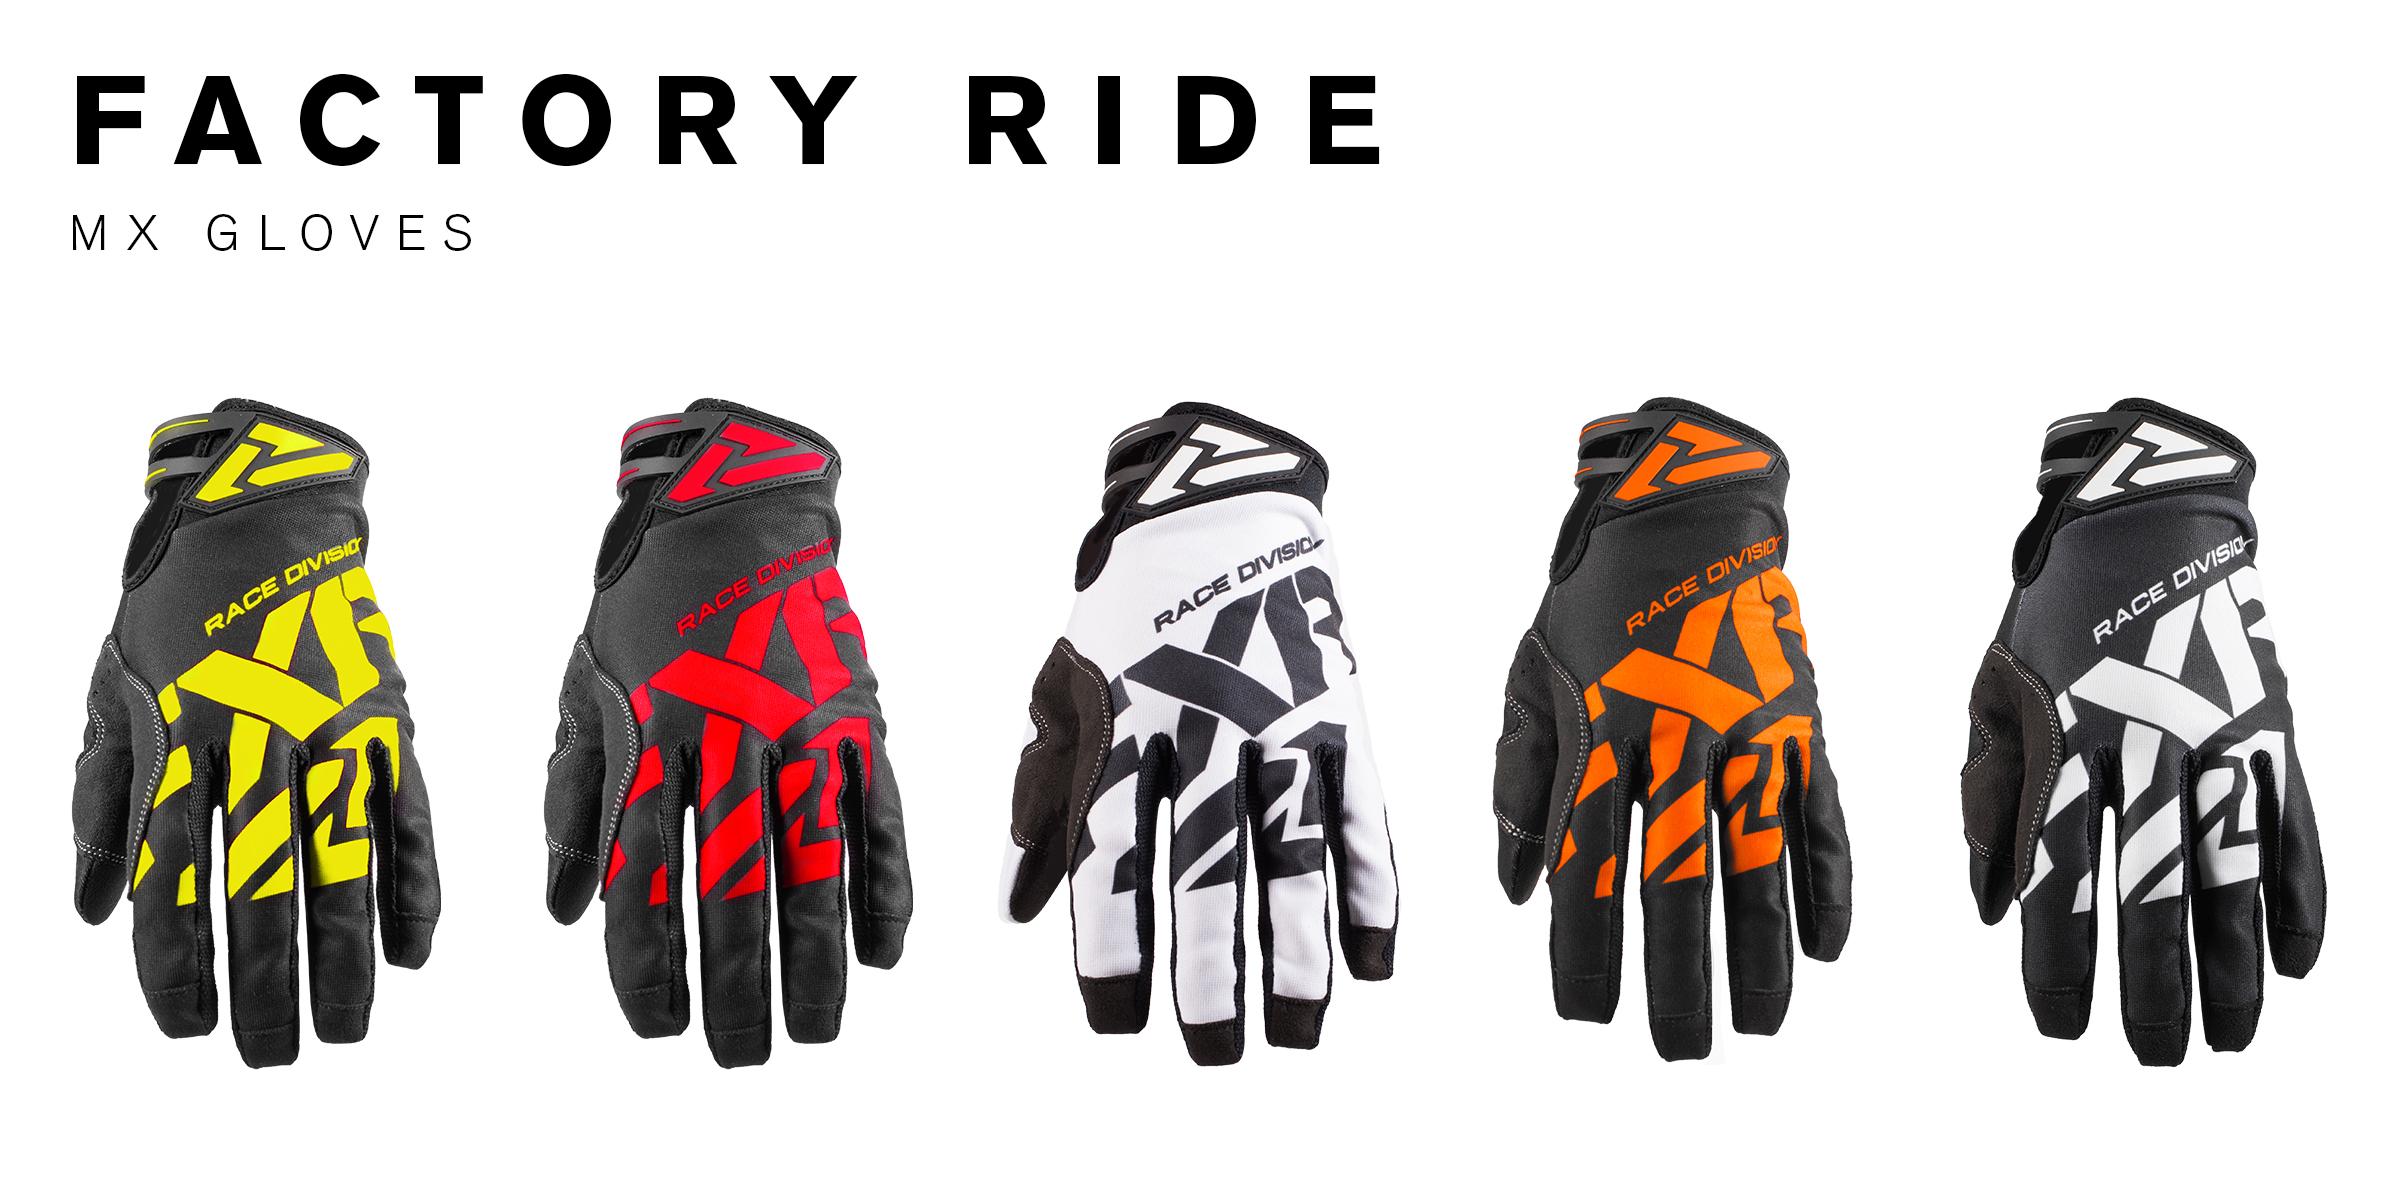 Factory Ride MX gloves 2018.jpg